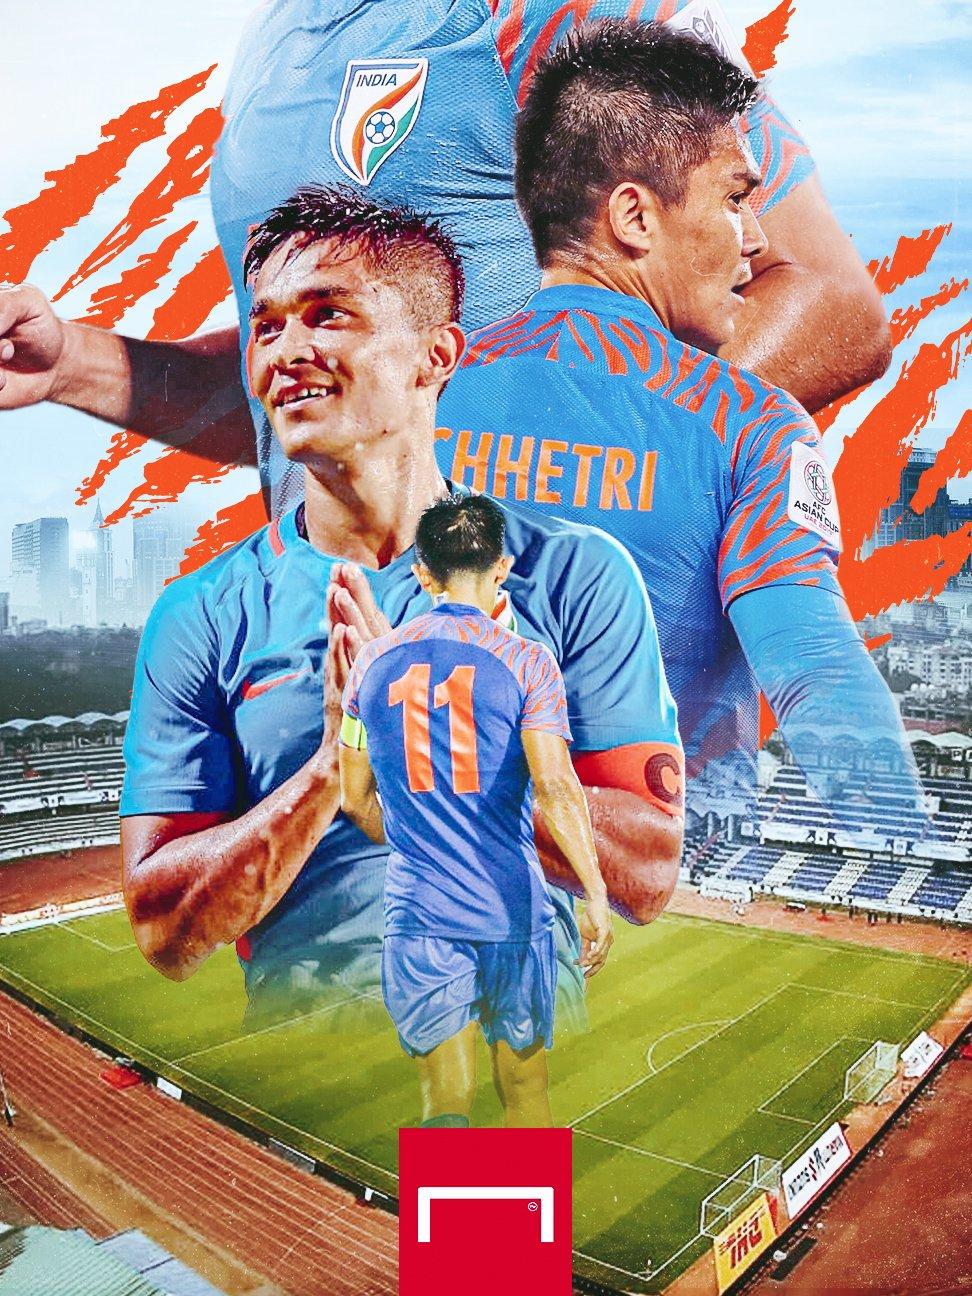 'I'm grateful for our friendship' – Indian cricket captain Virat Kohli wishes Sunil Chhetri on his 37th birthday